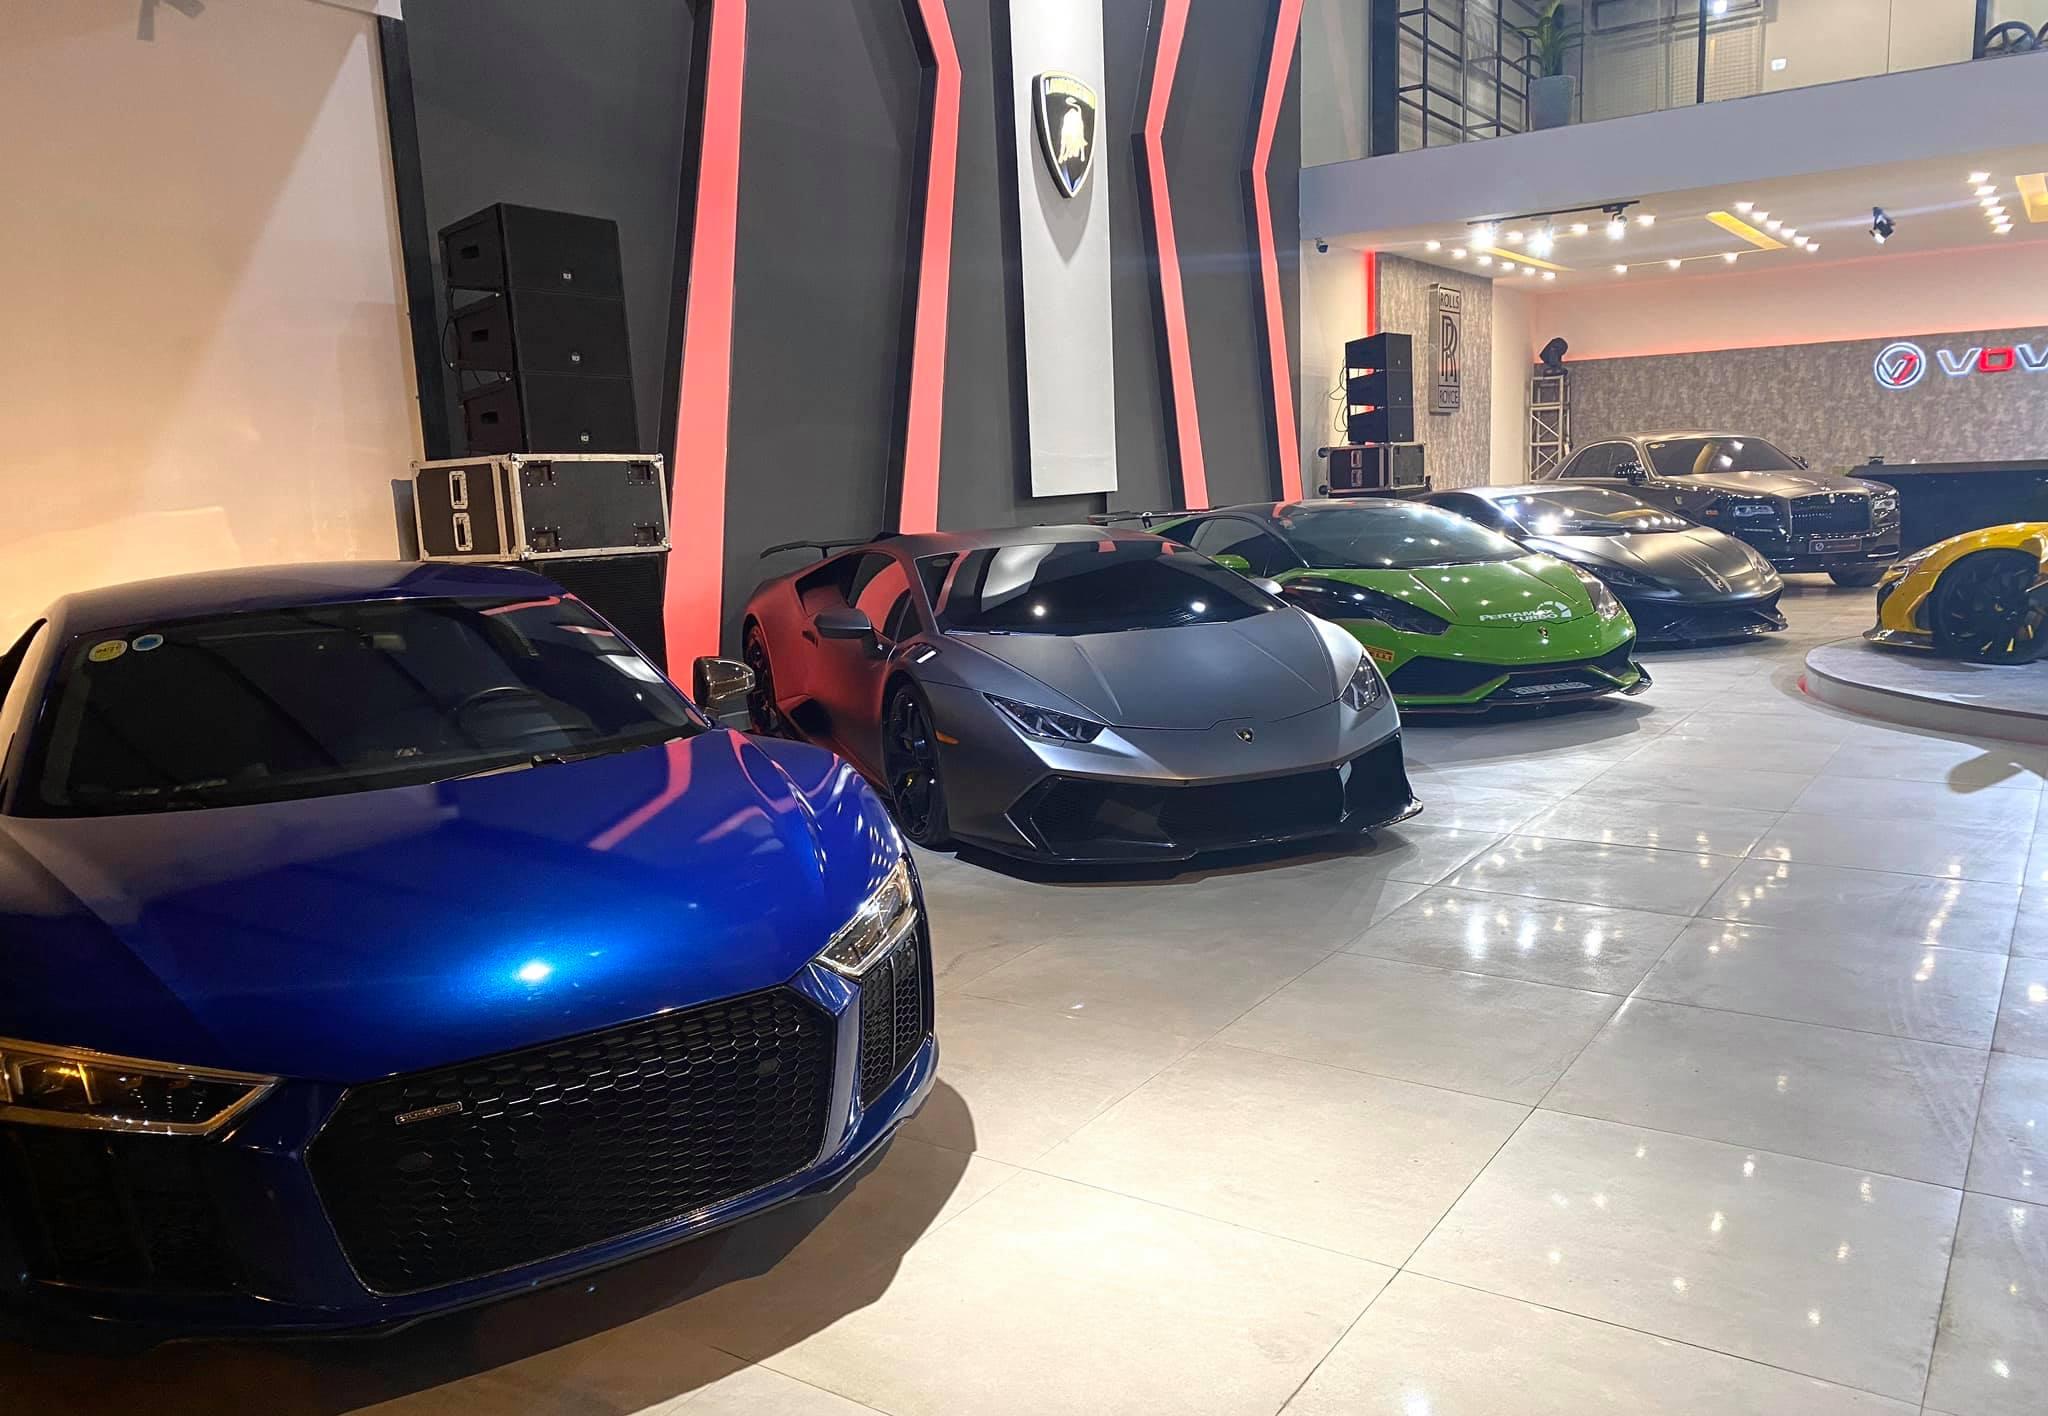 showroom-sieu-xe-79157874-1042919426059155-368543197980262400-o.jpg